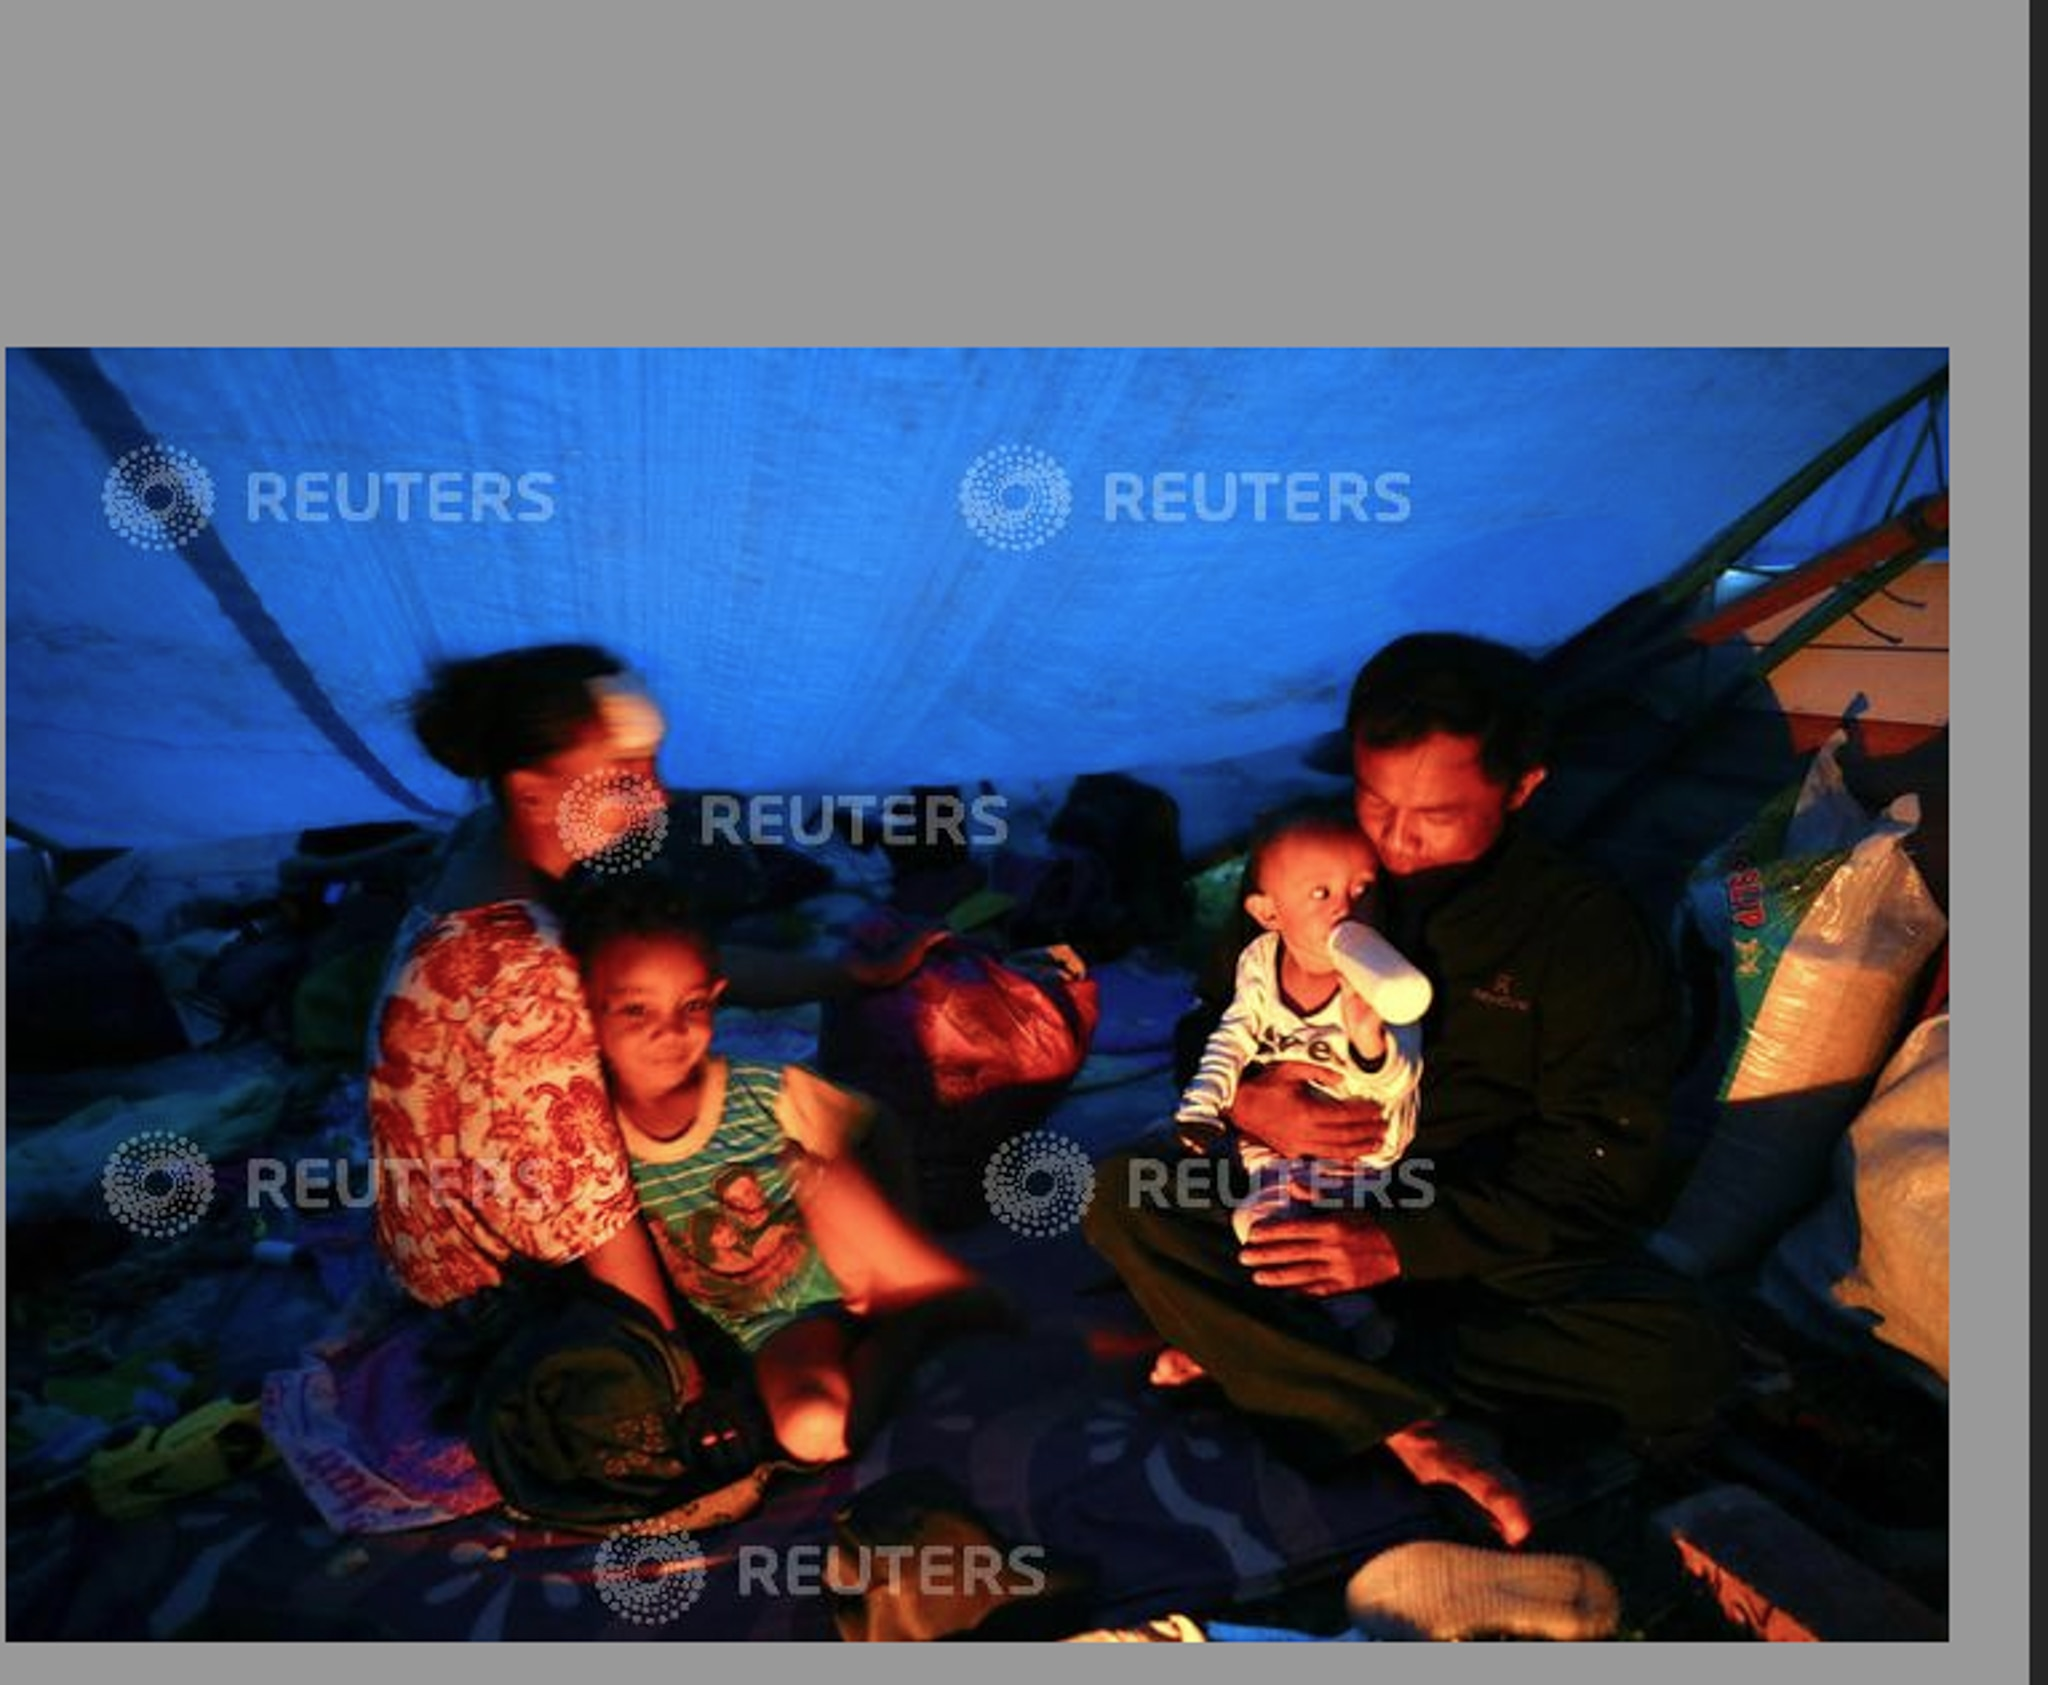 (REUTERS/Athit Perawongmetha)